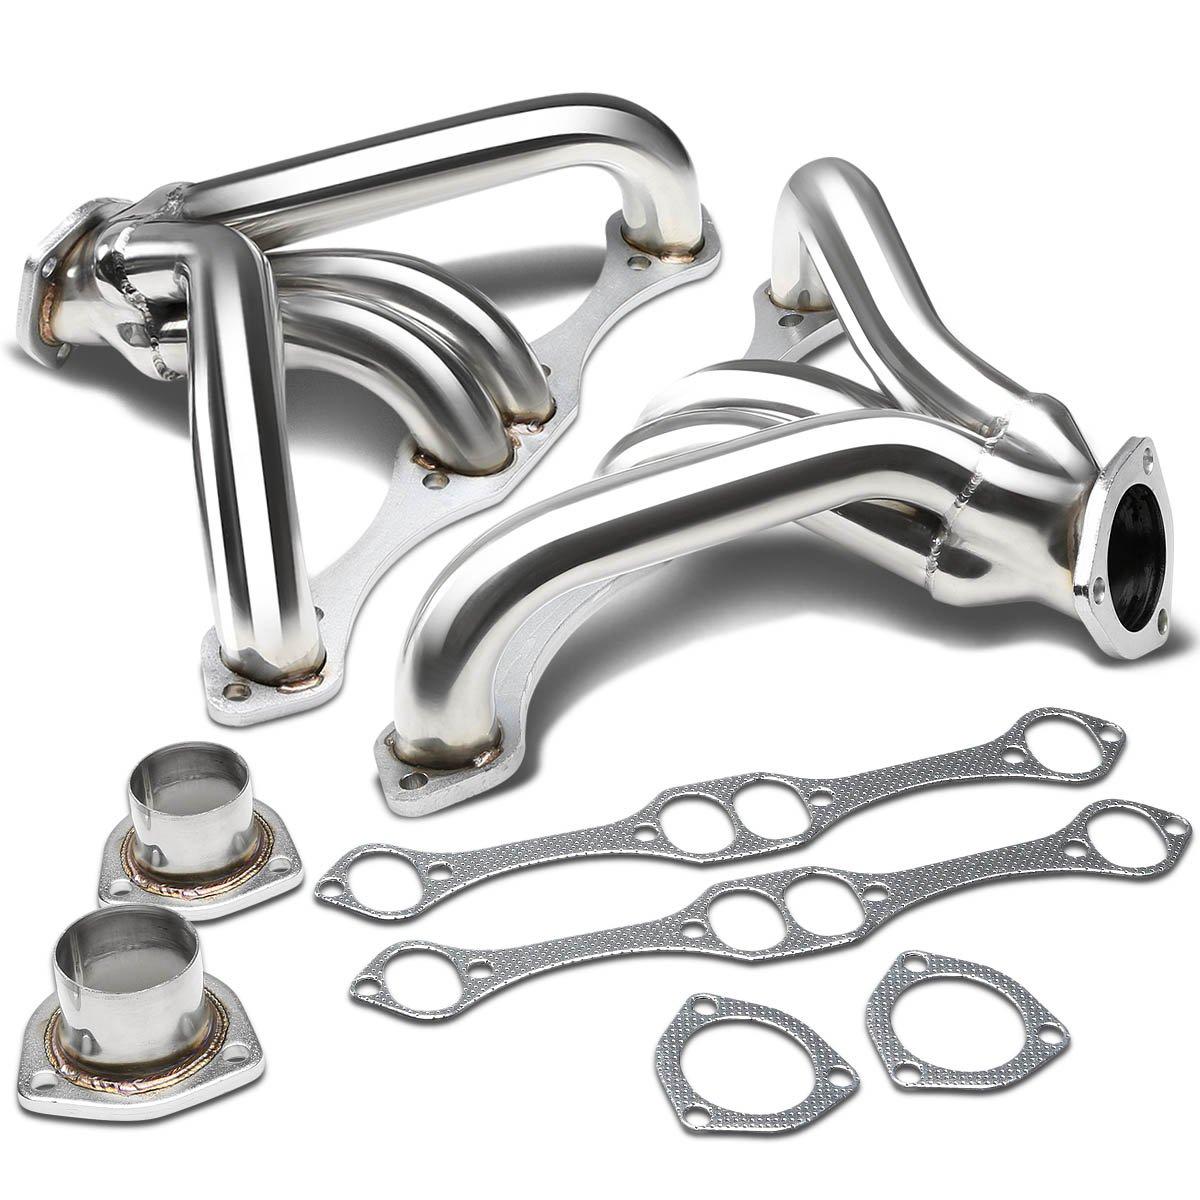 DNA motoring HDS-SBC-AP Stainless Steel Exhaust Header Manifold